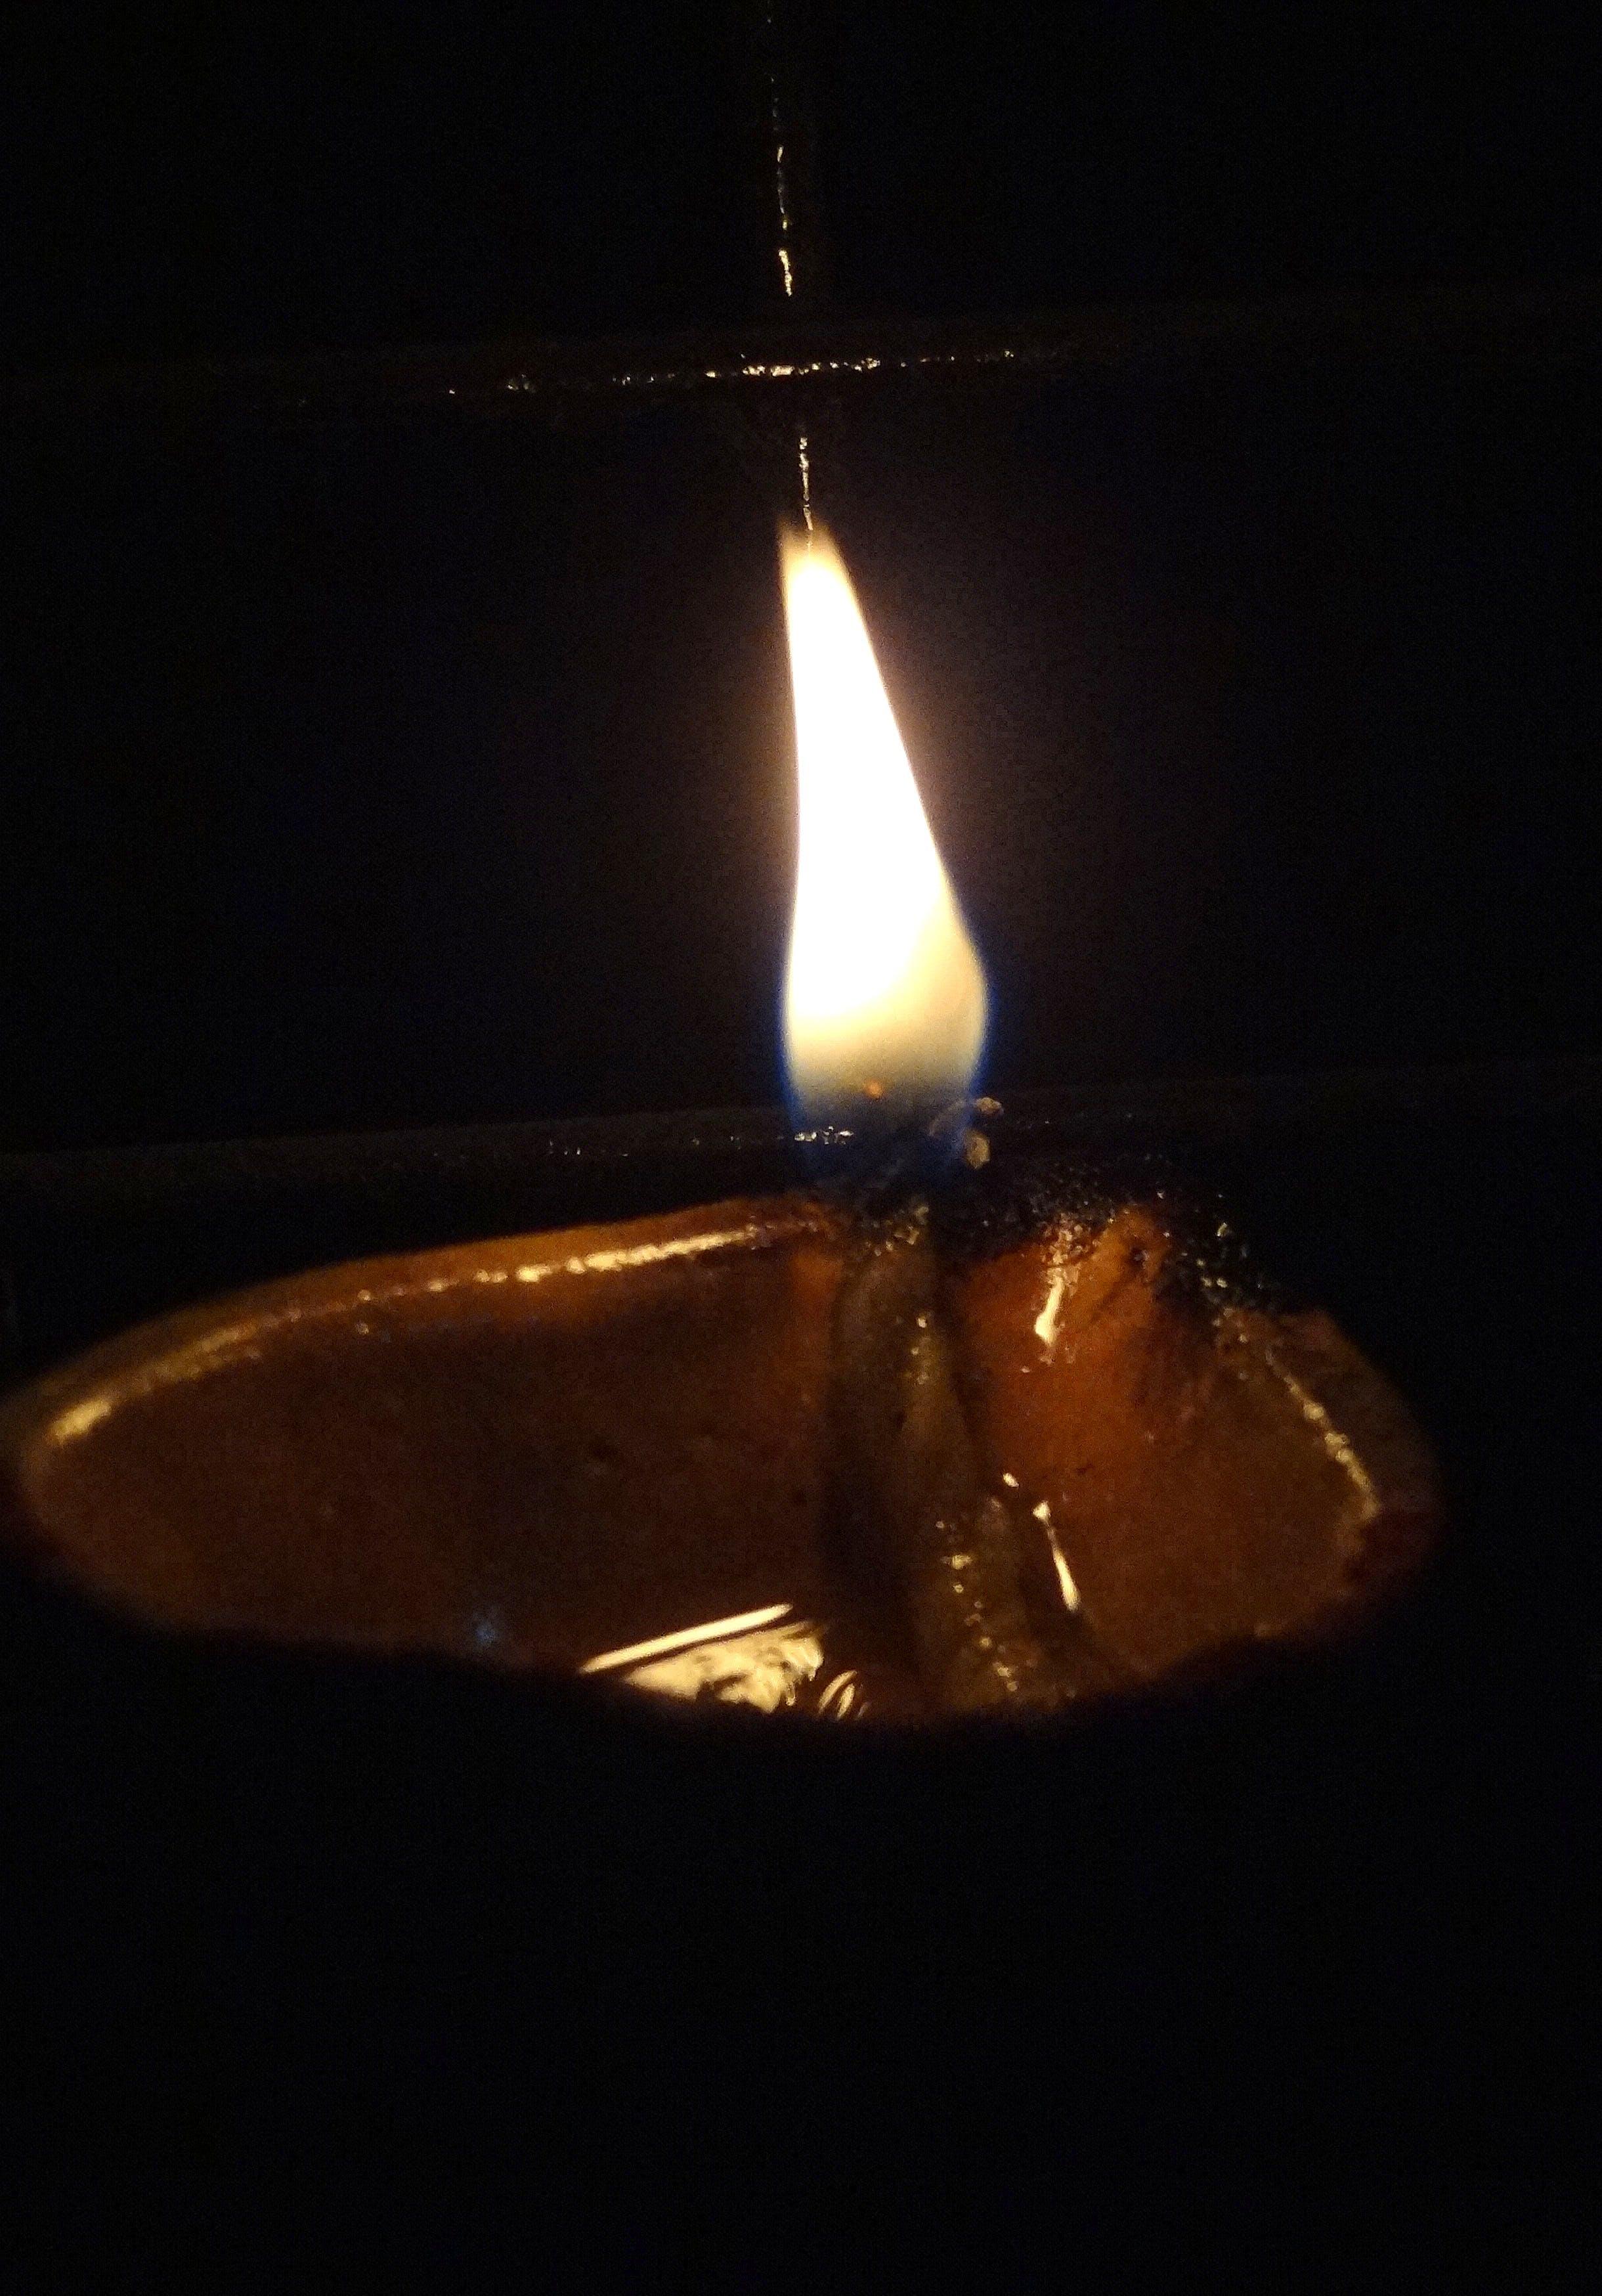 Free stock photo of OIL-EARTHEN LAMP